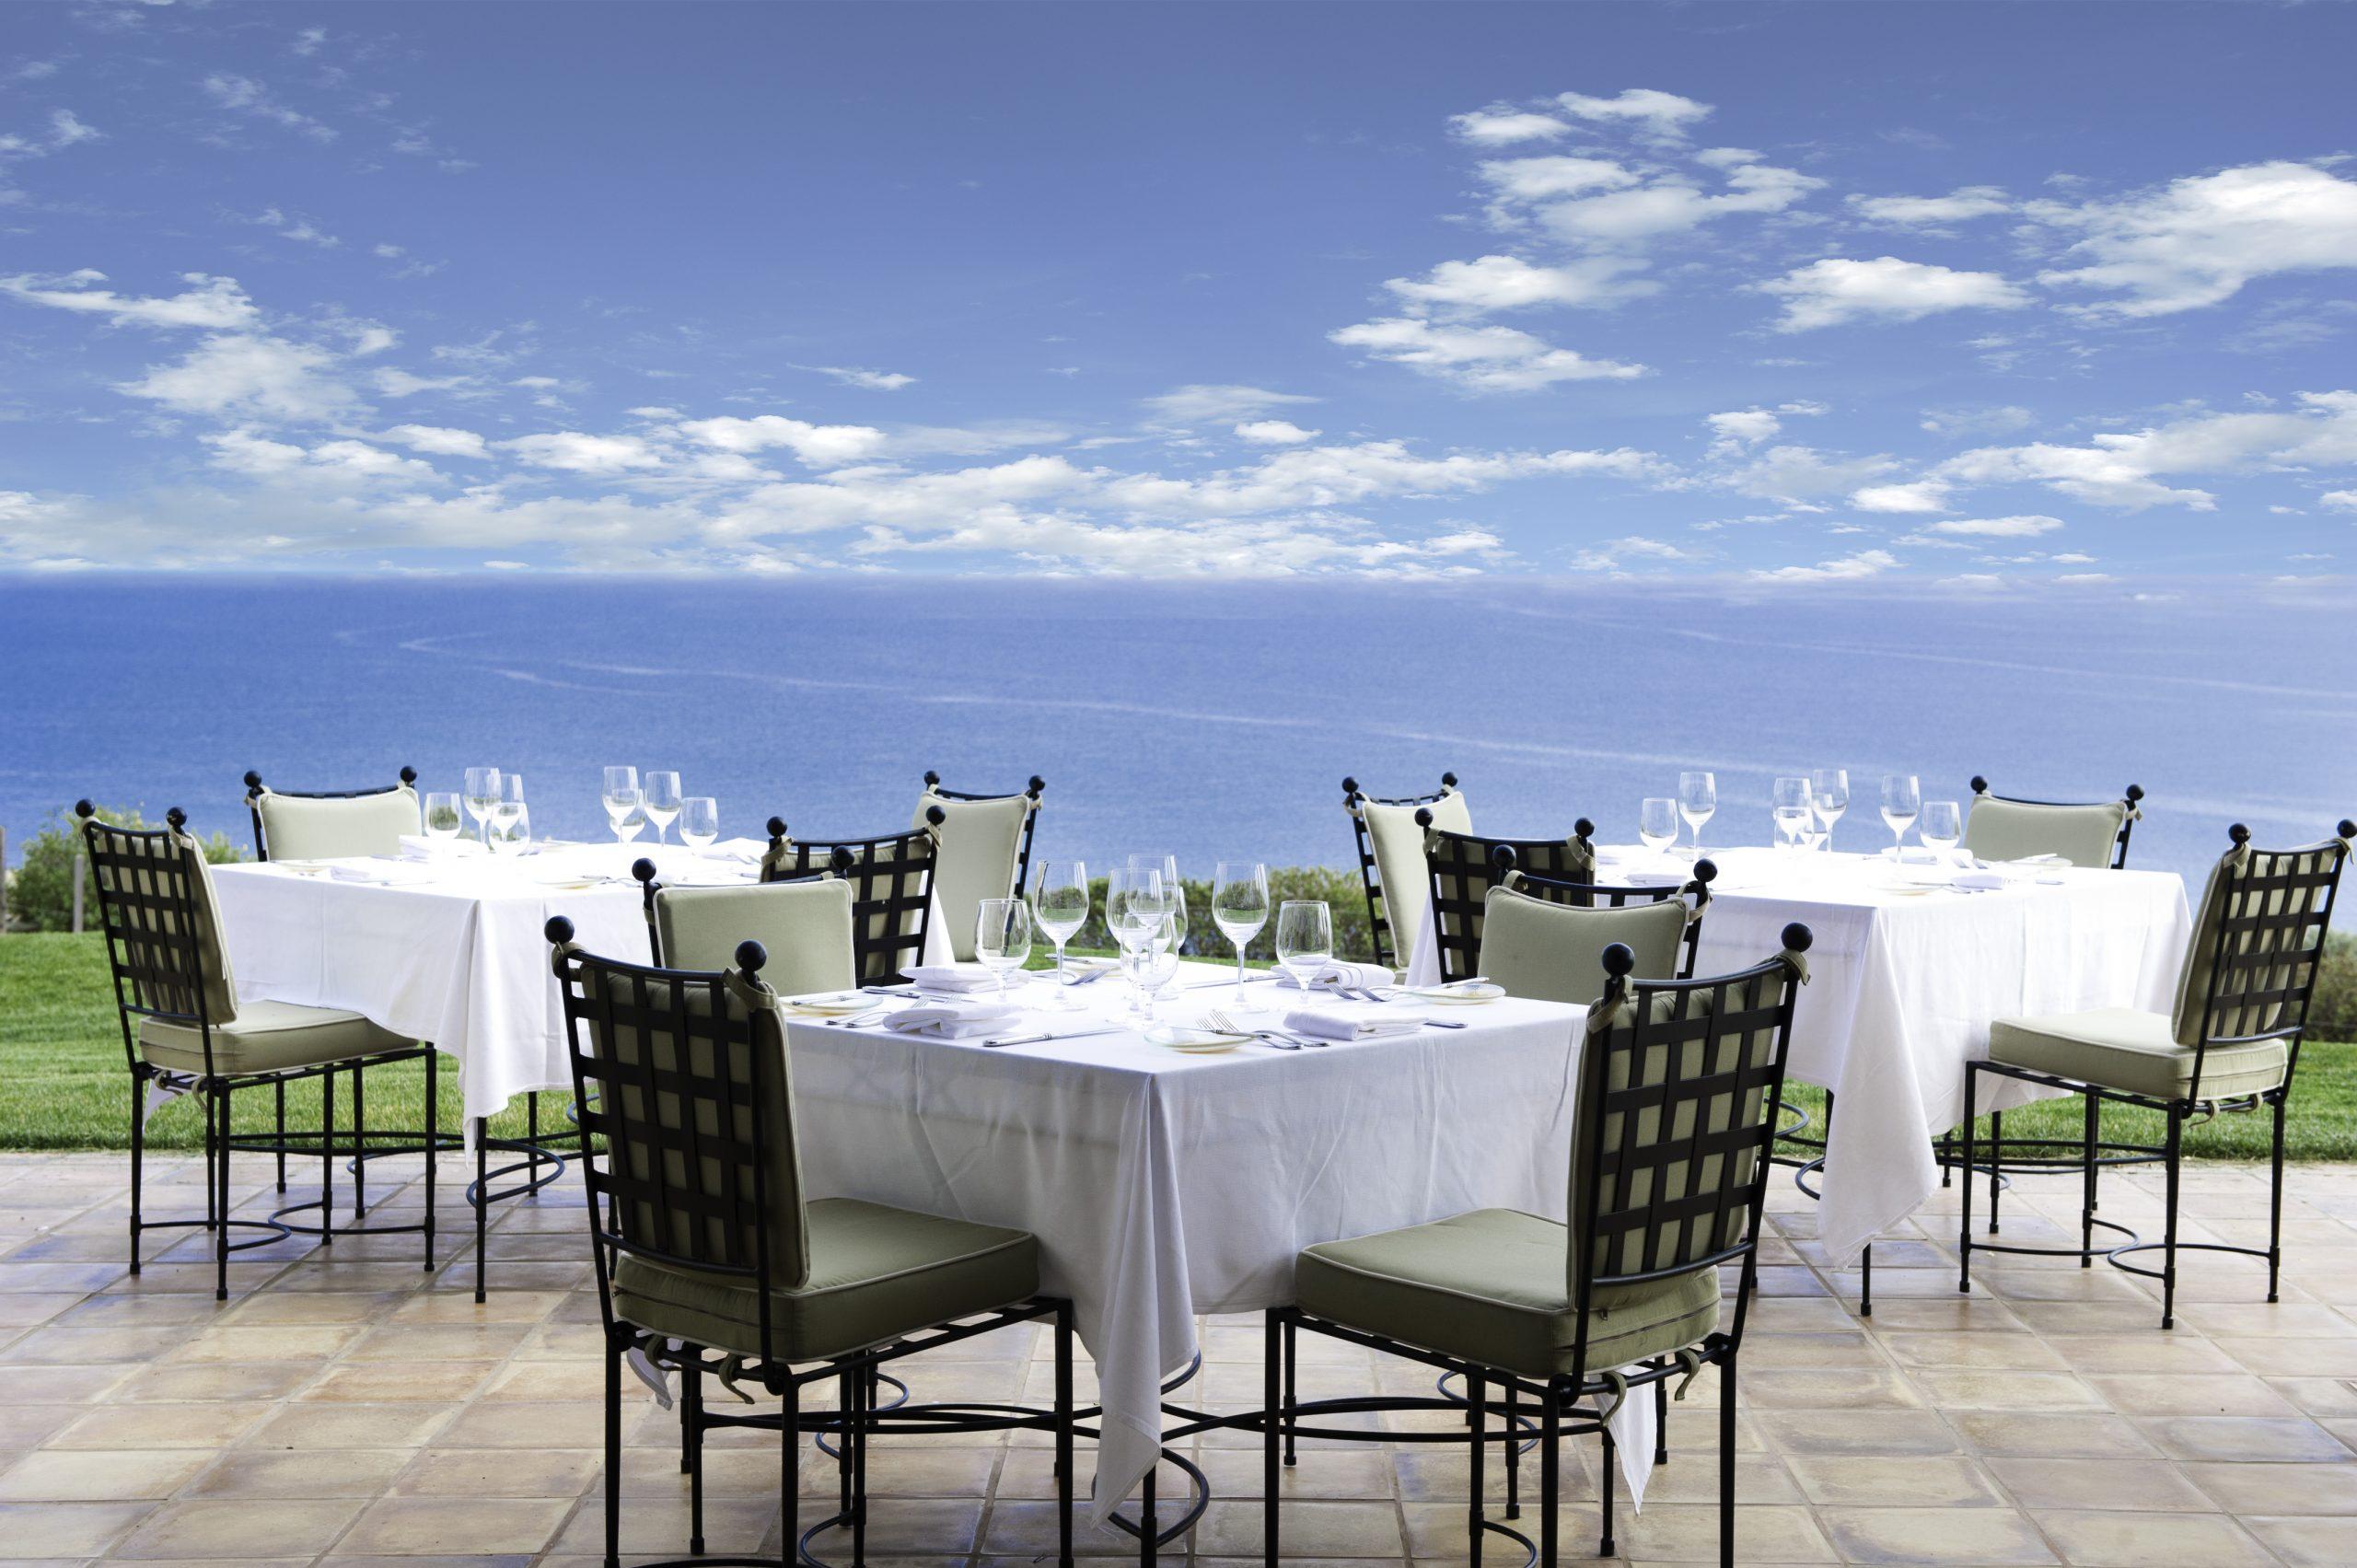 Patio dining at Mar'sel Restaurant at Terranea Resort